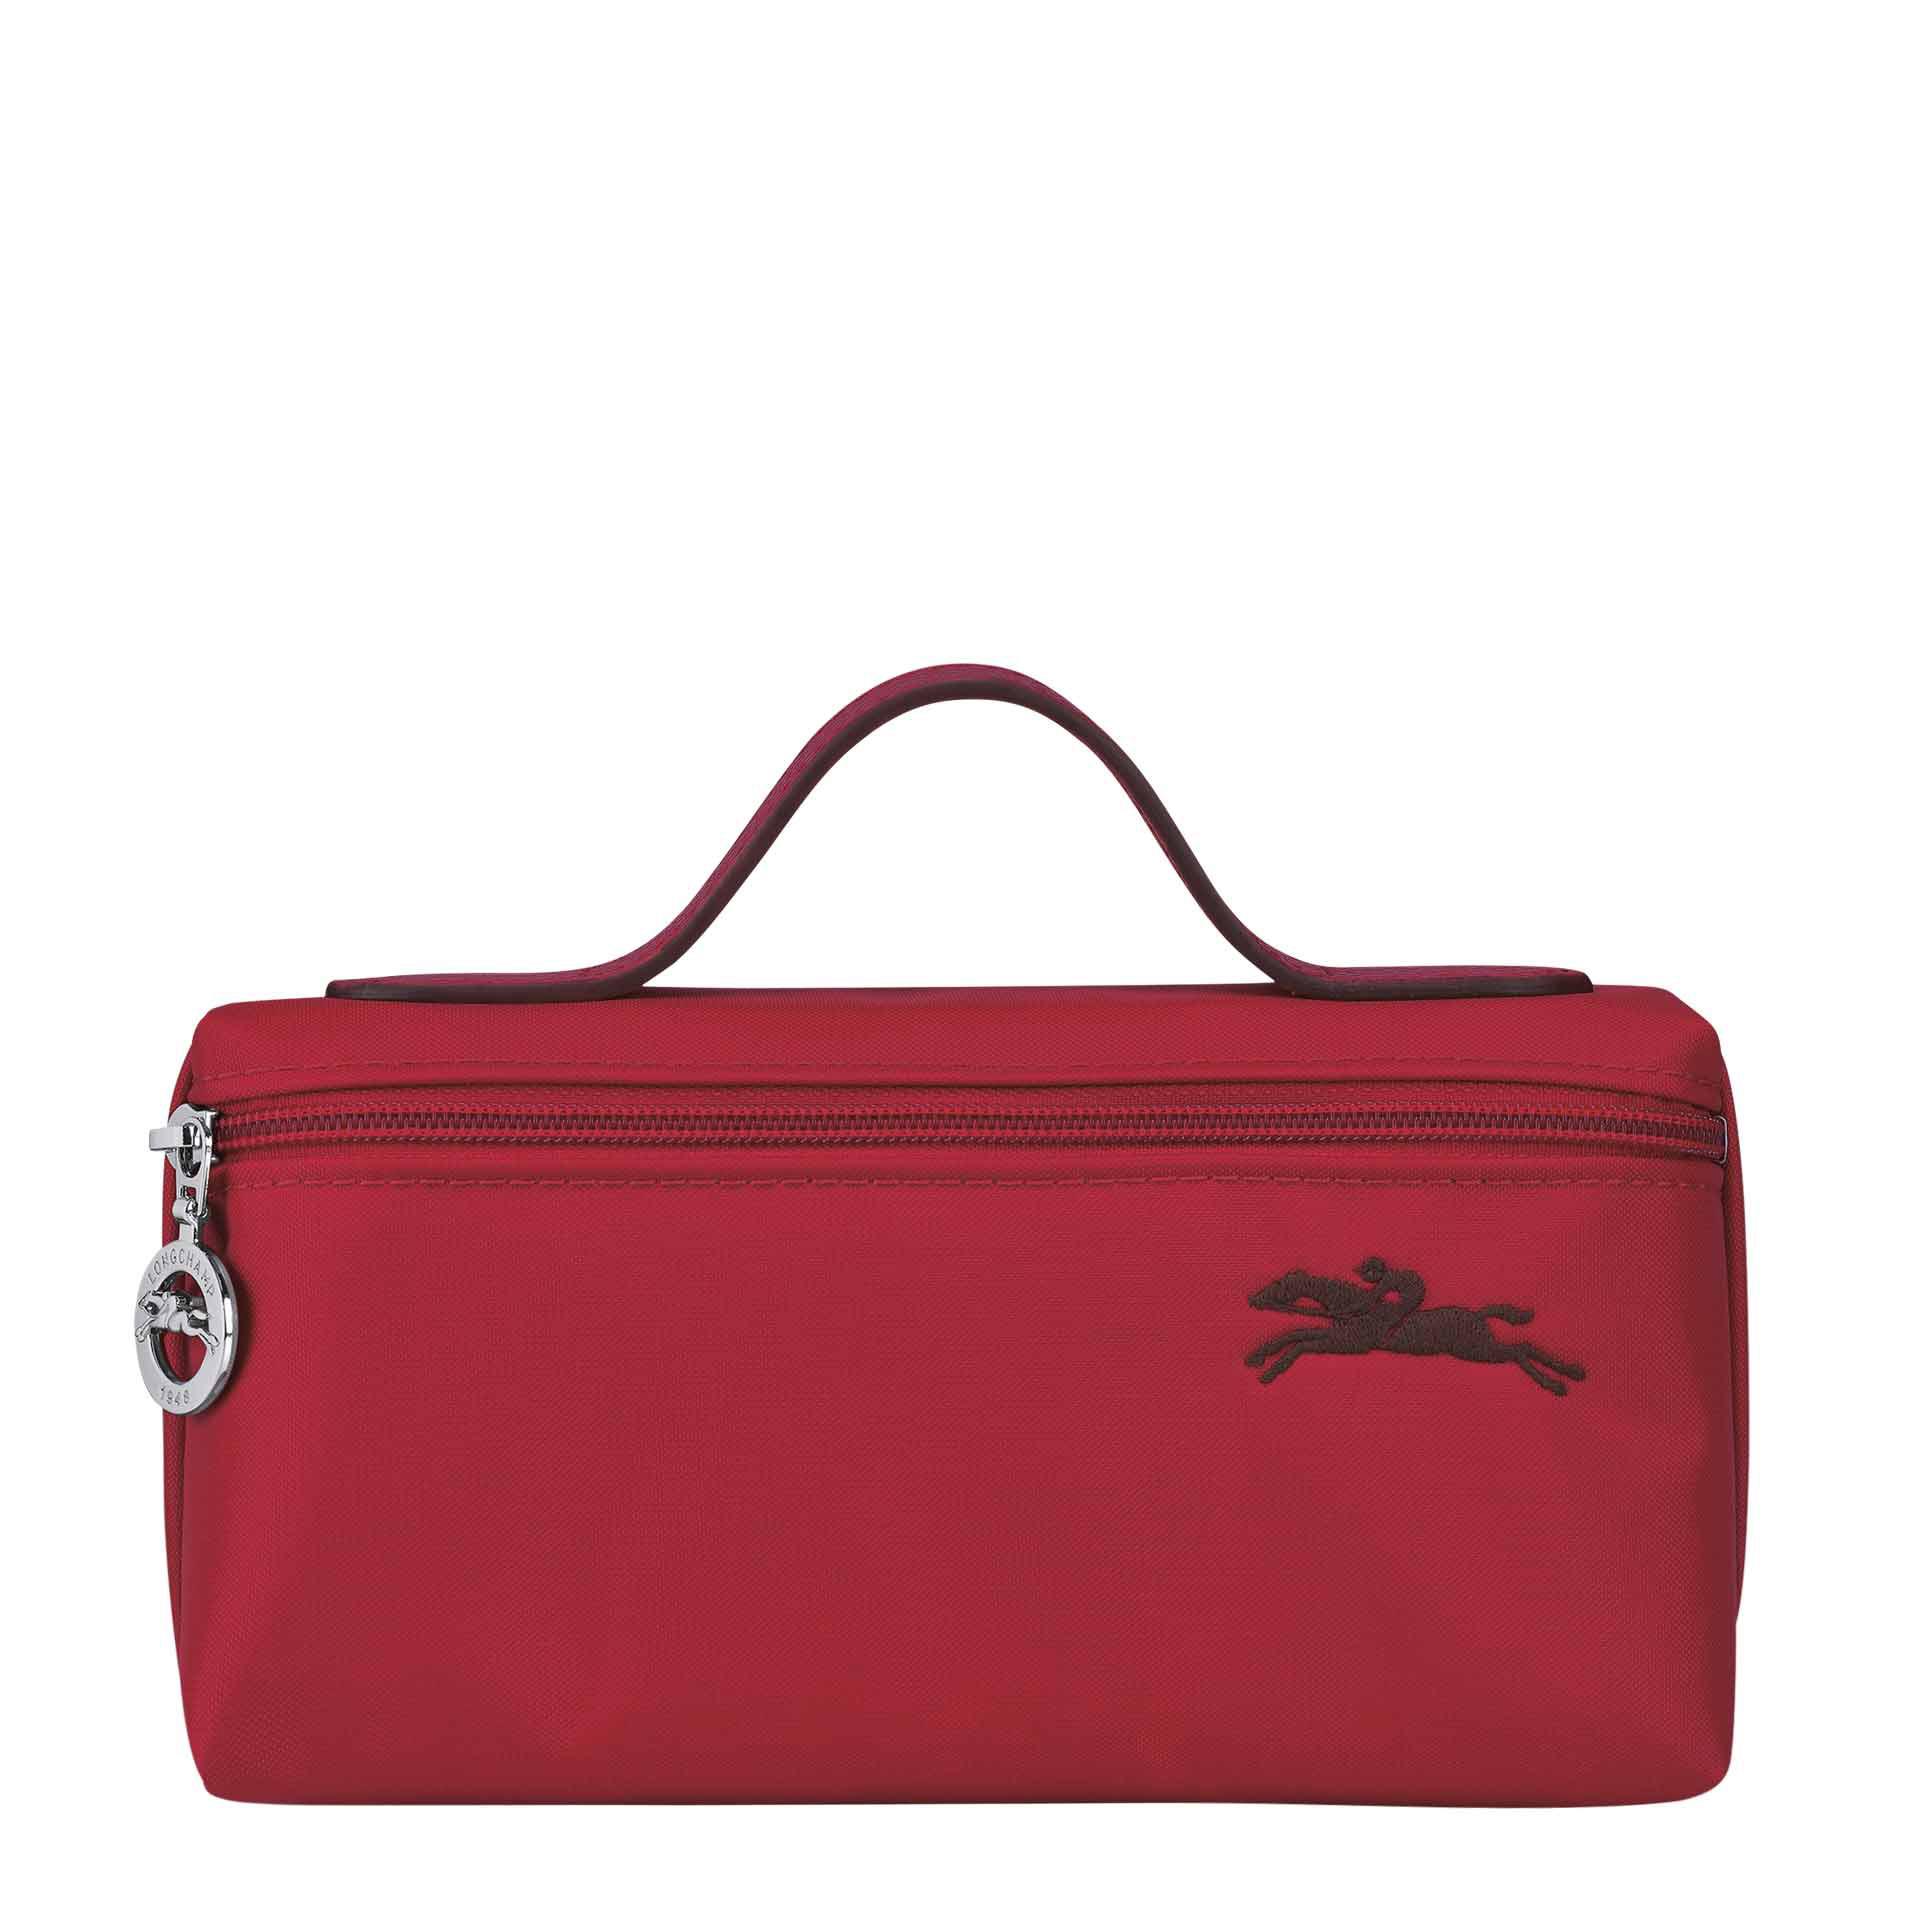 Longchamp Le Pliage Club Pochette red